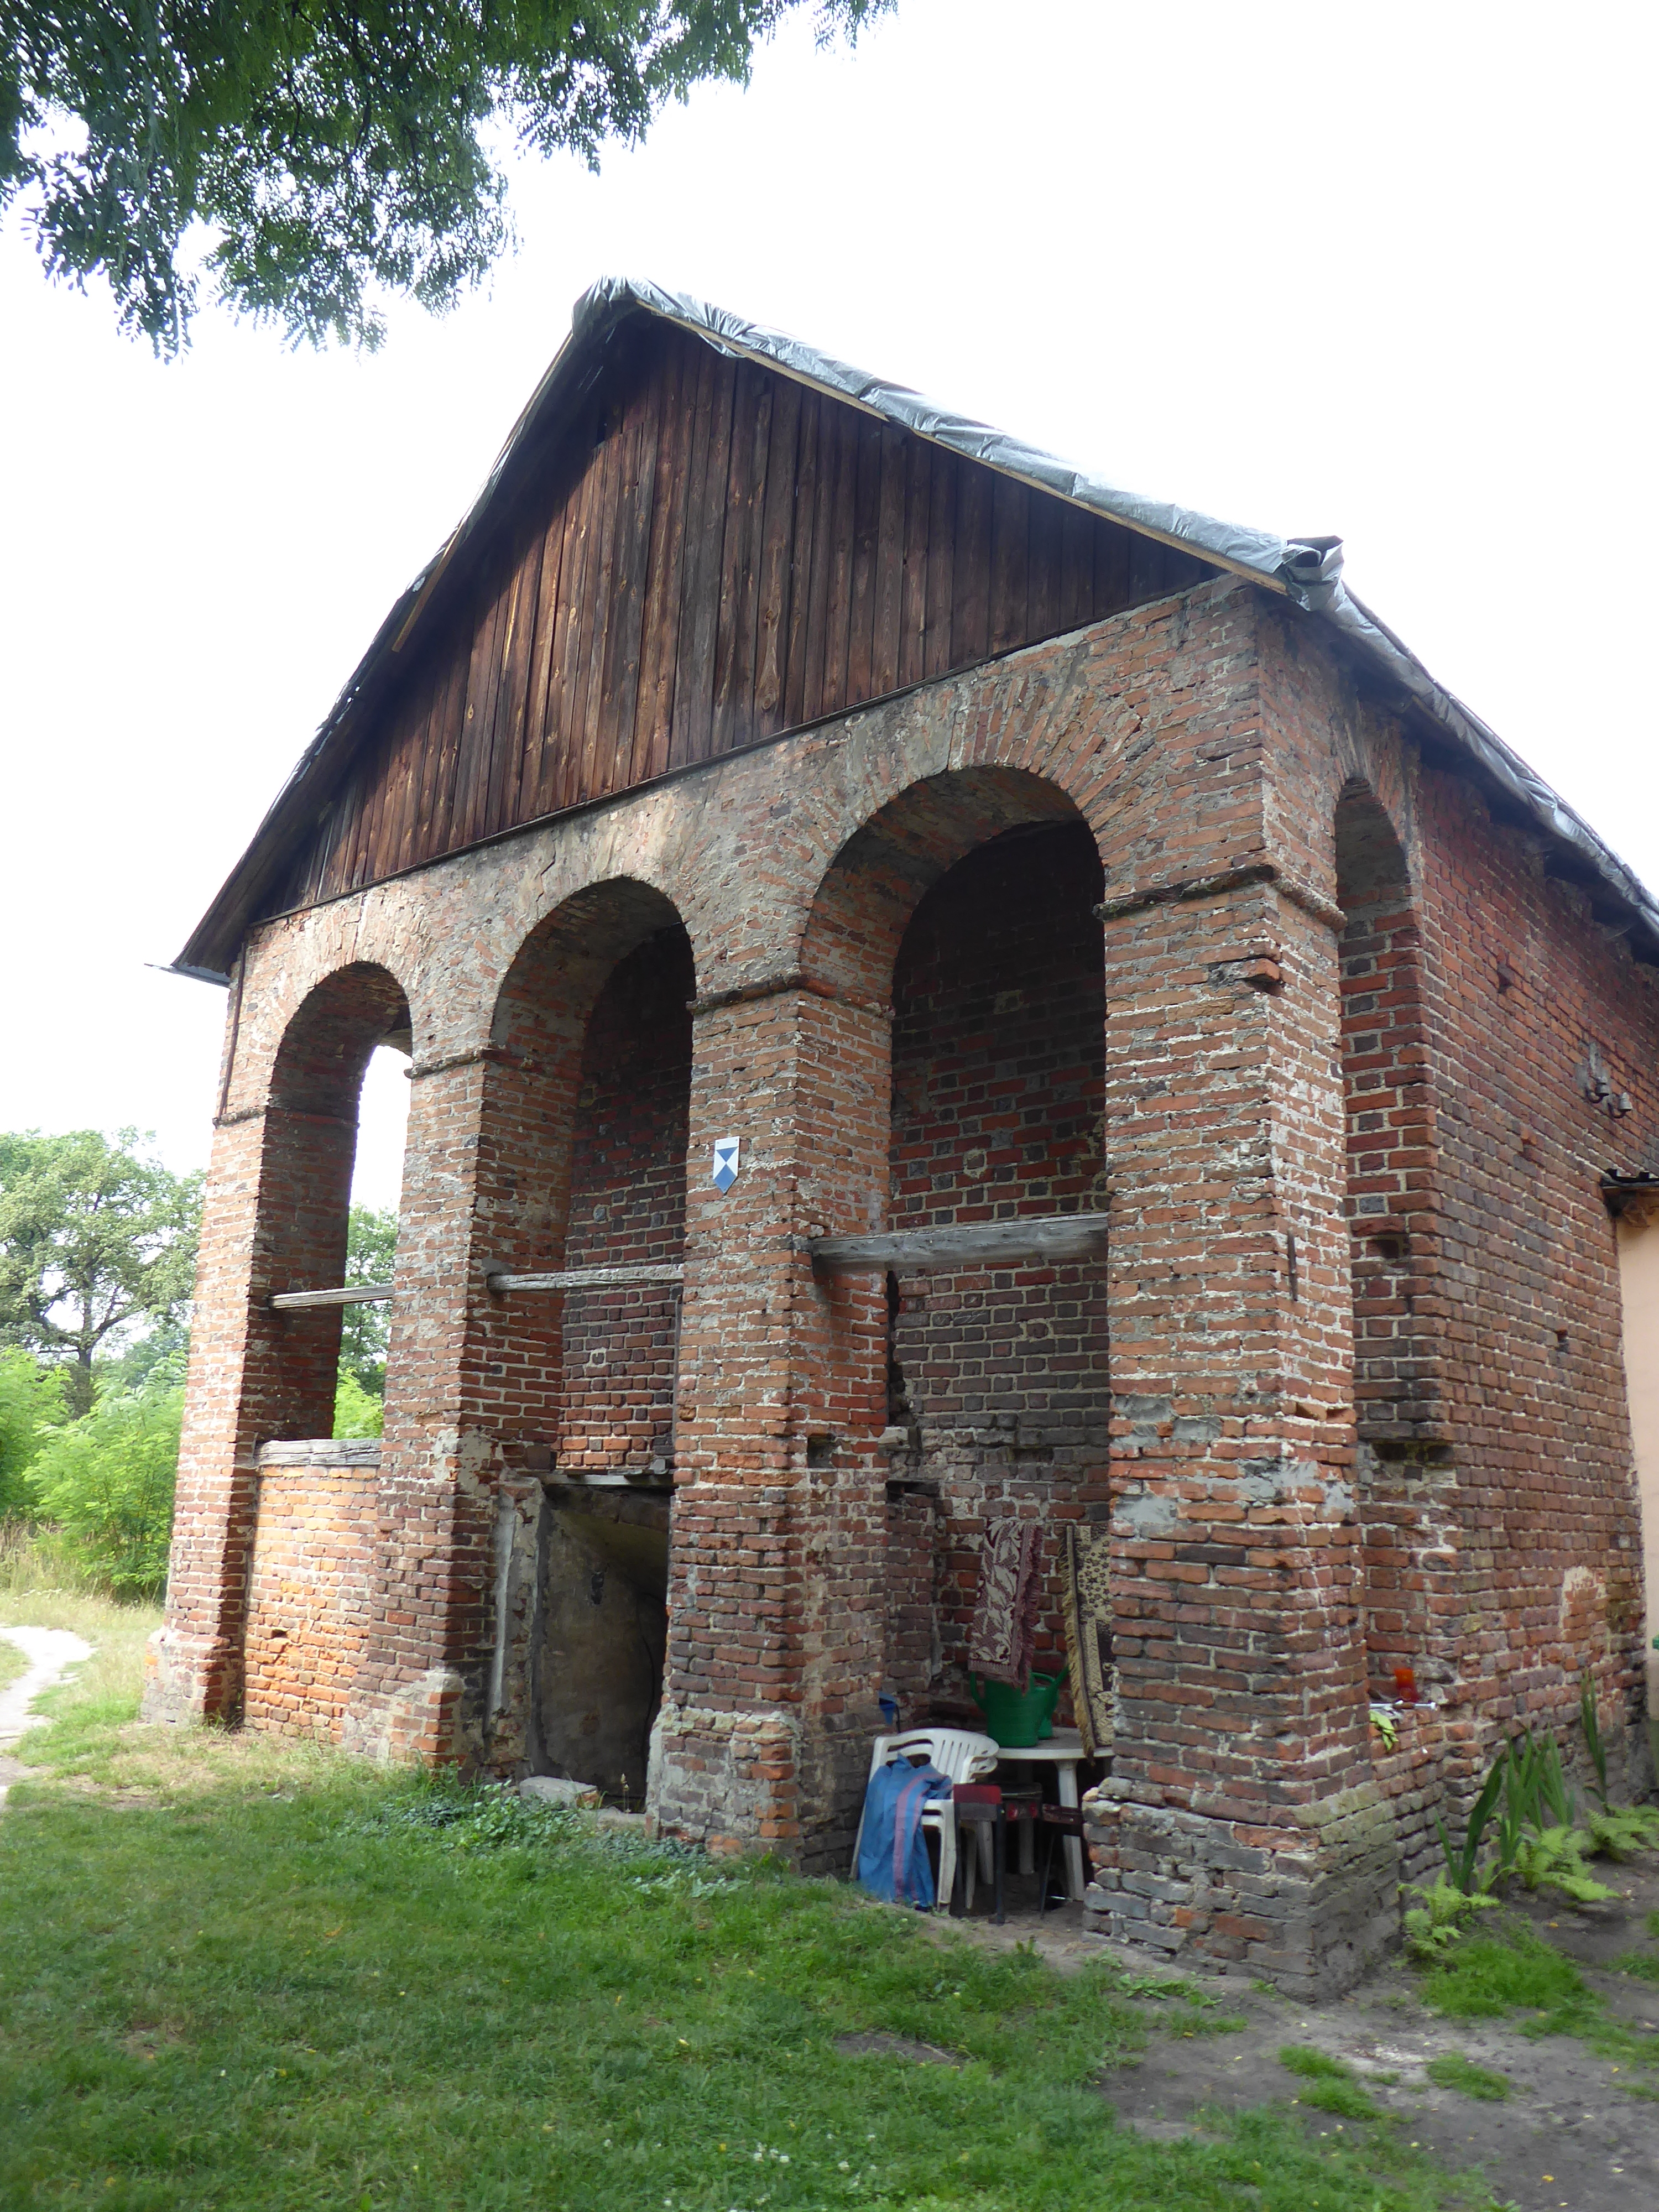 Moskorzew schoolhouse